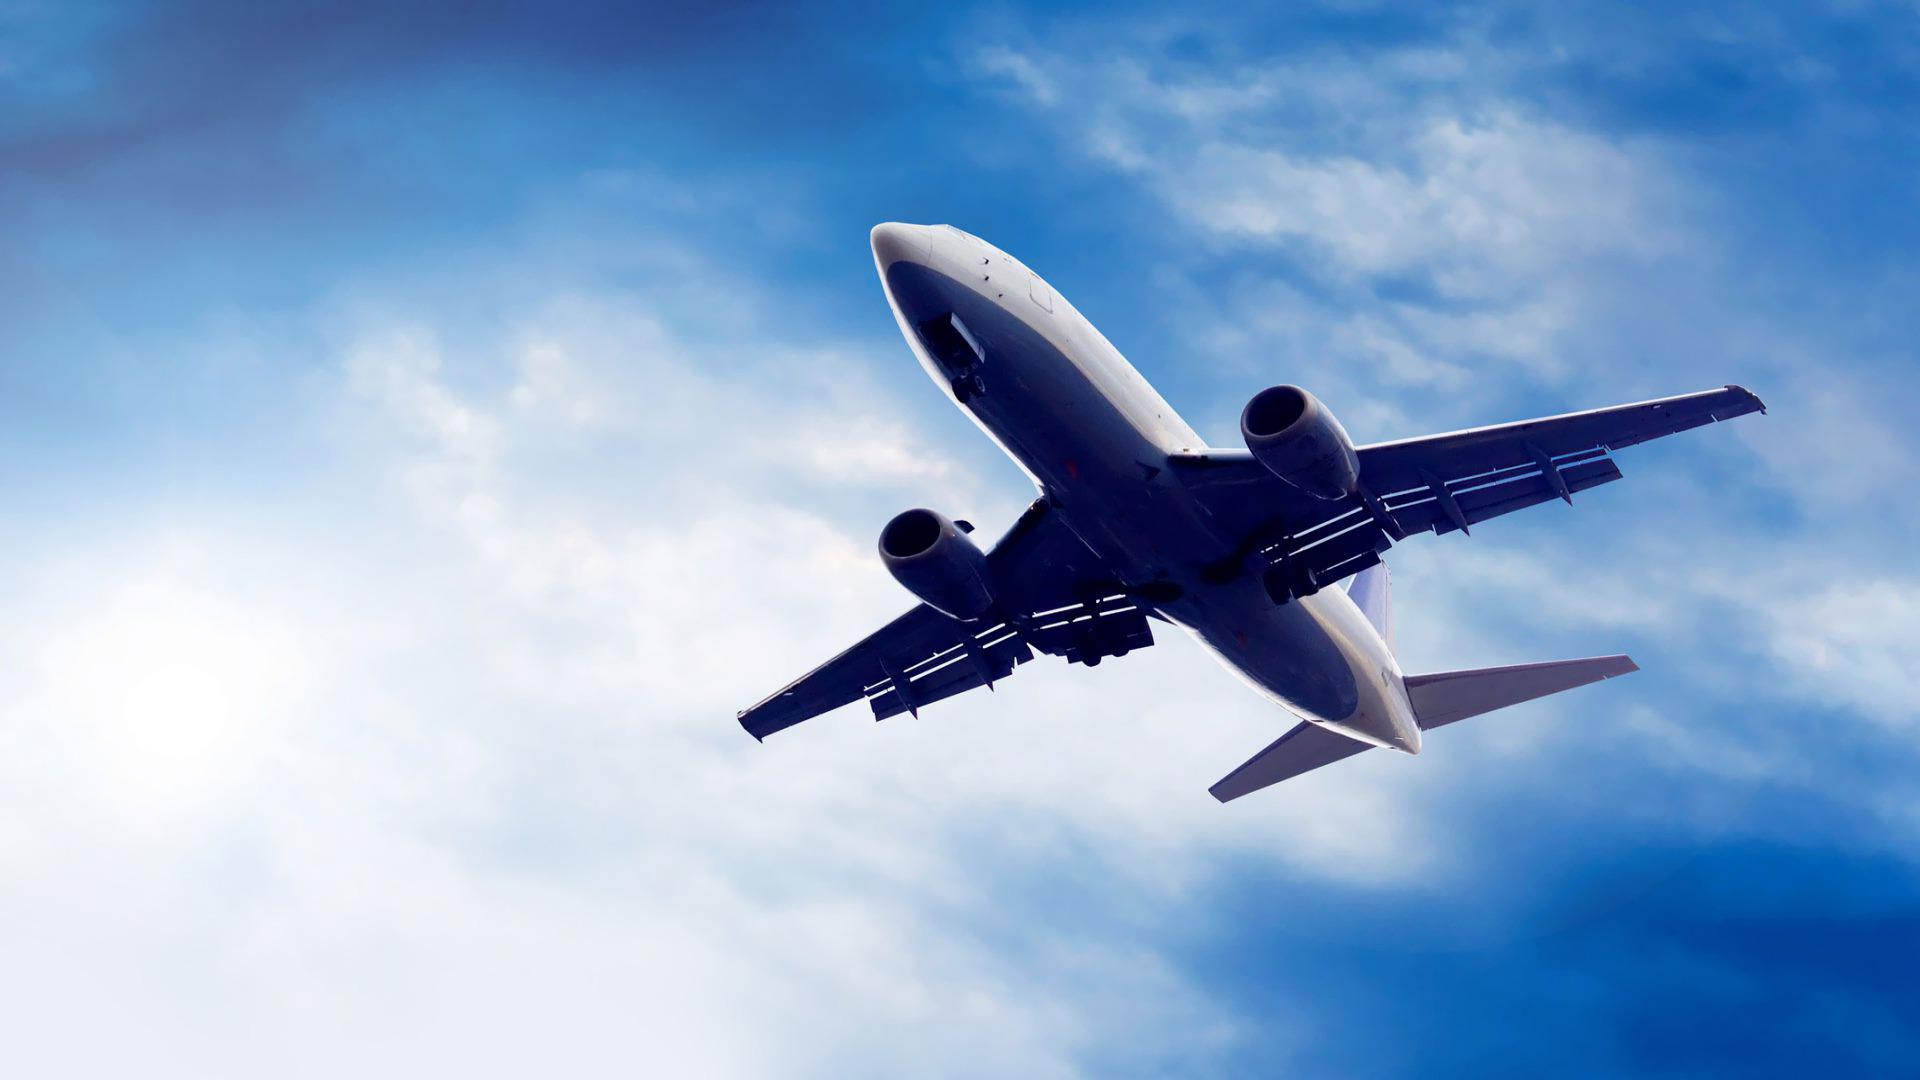 download Passenger plane wallpaper 384111 [1920x1080] for 1920x1080